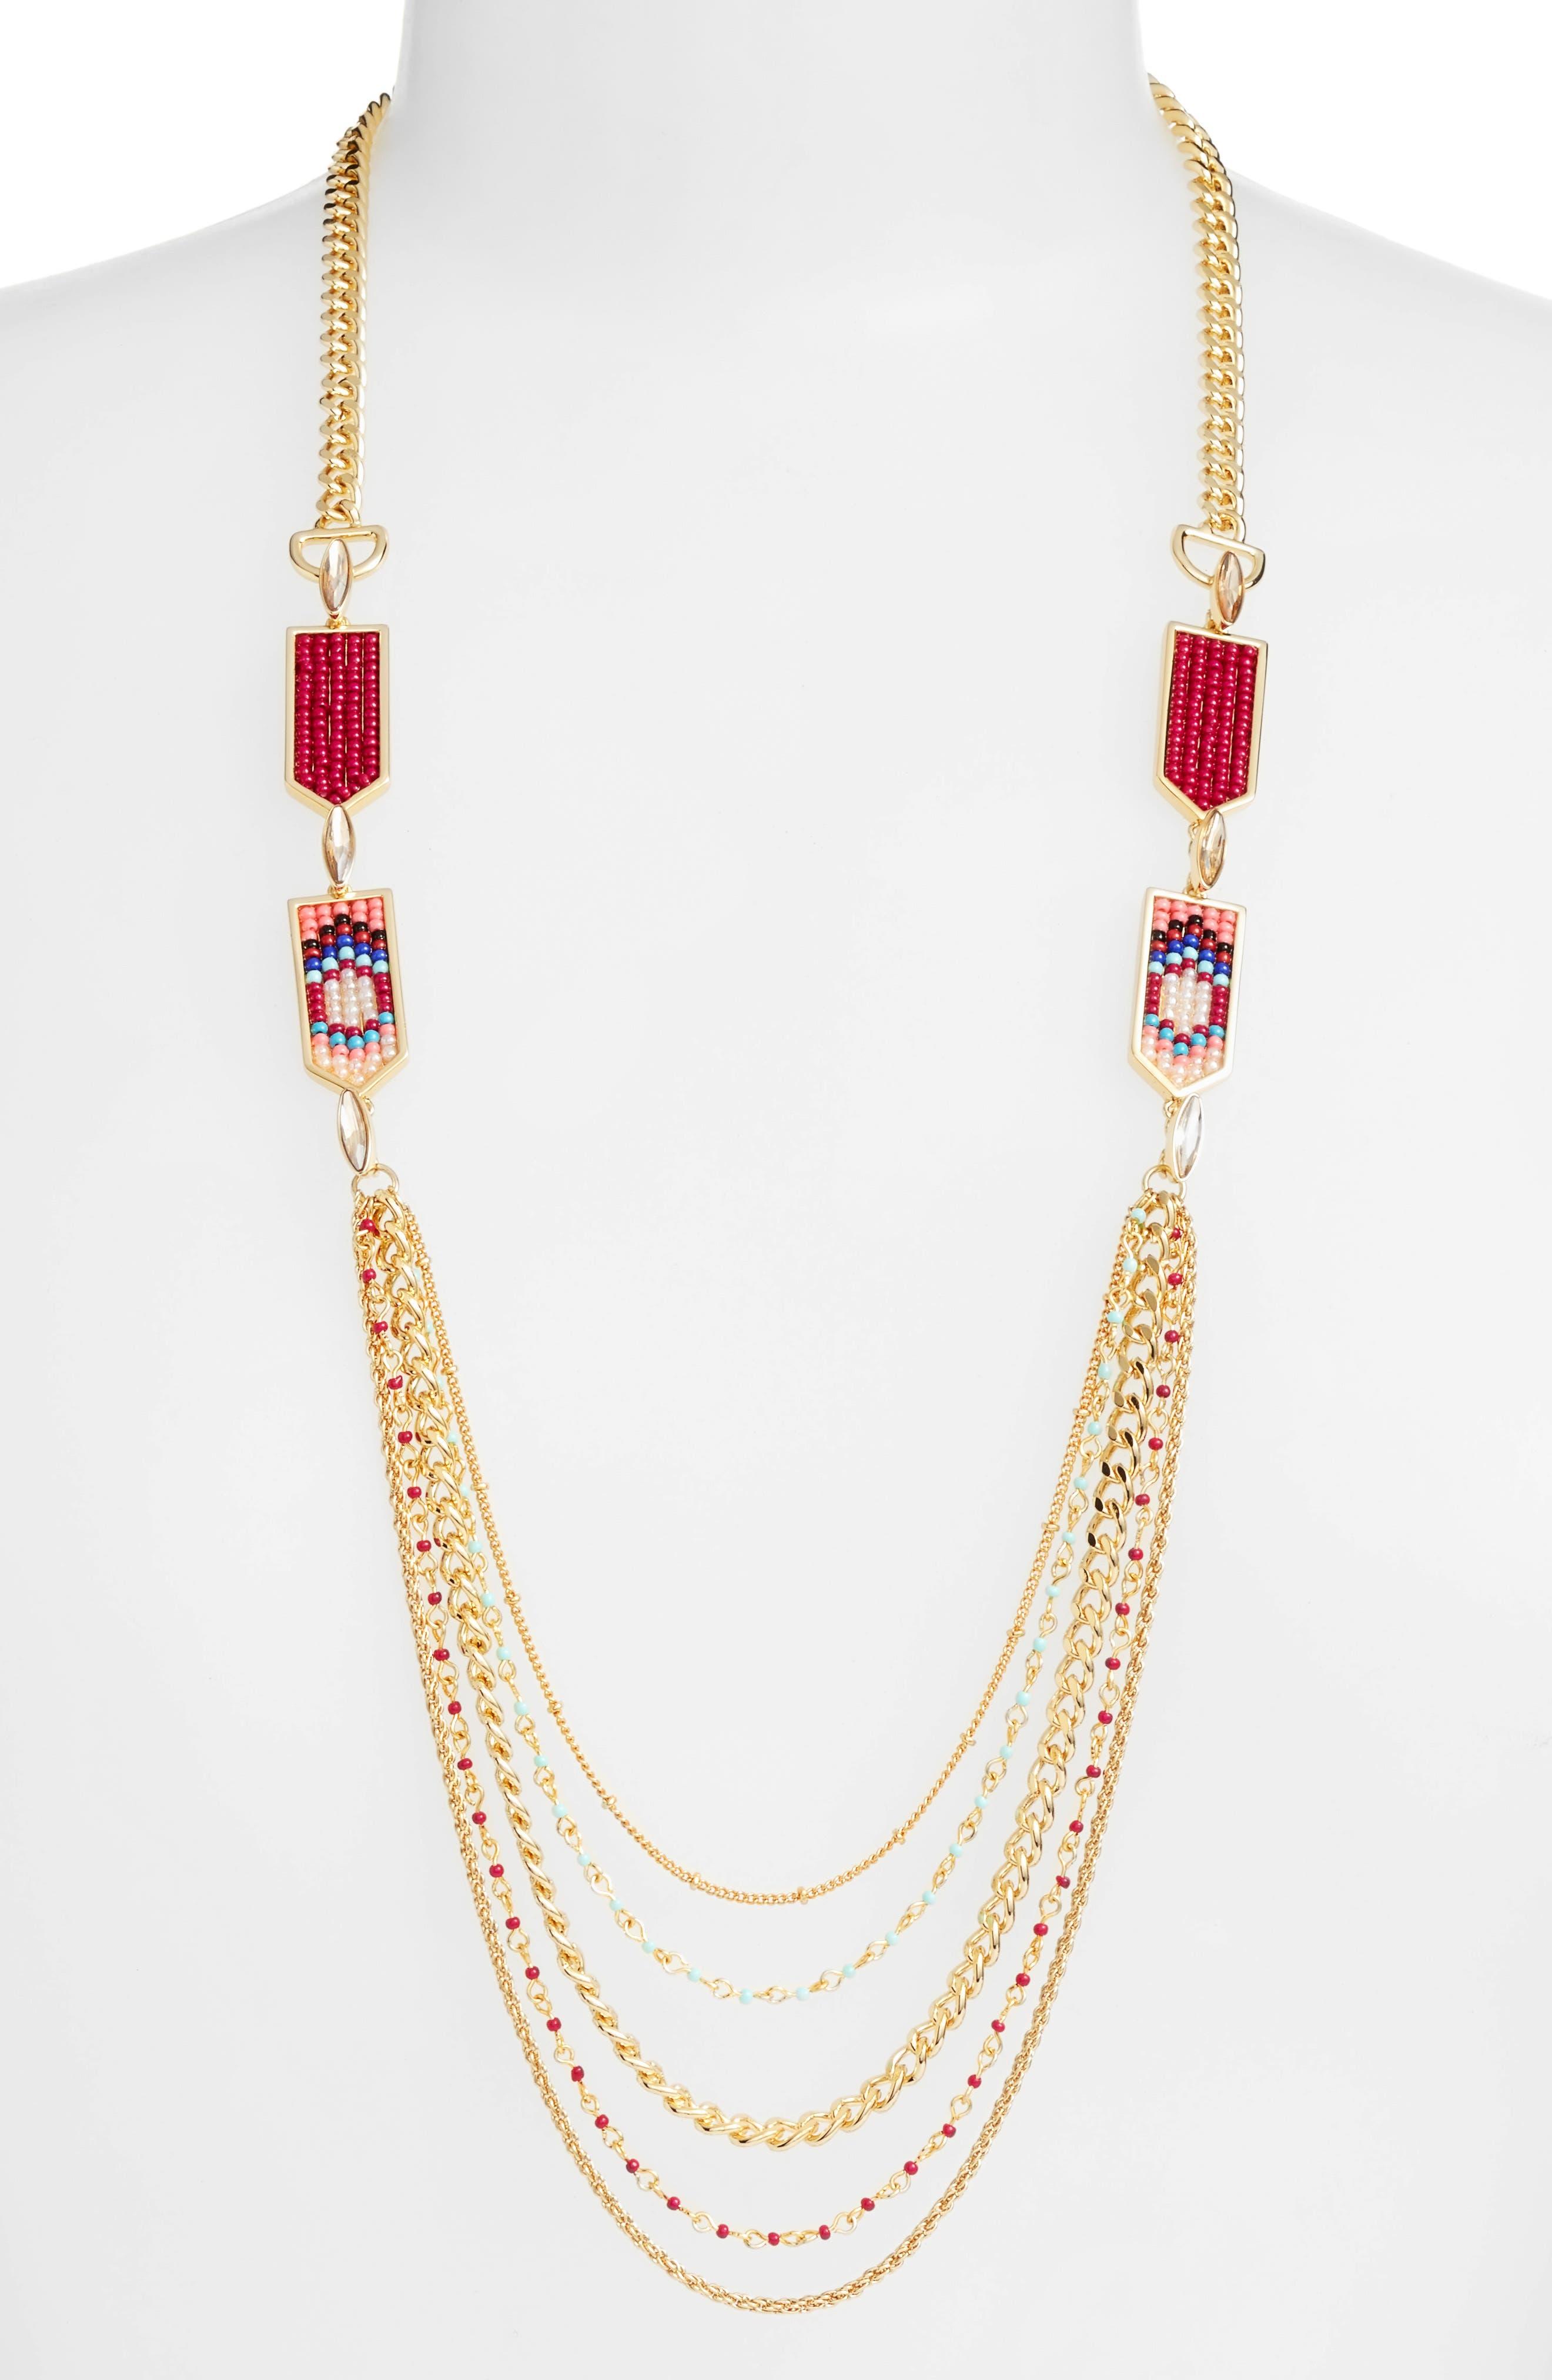 Main Image - Rebecca Minkoff Catalina Seed Bead Multi Strand Necklace